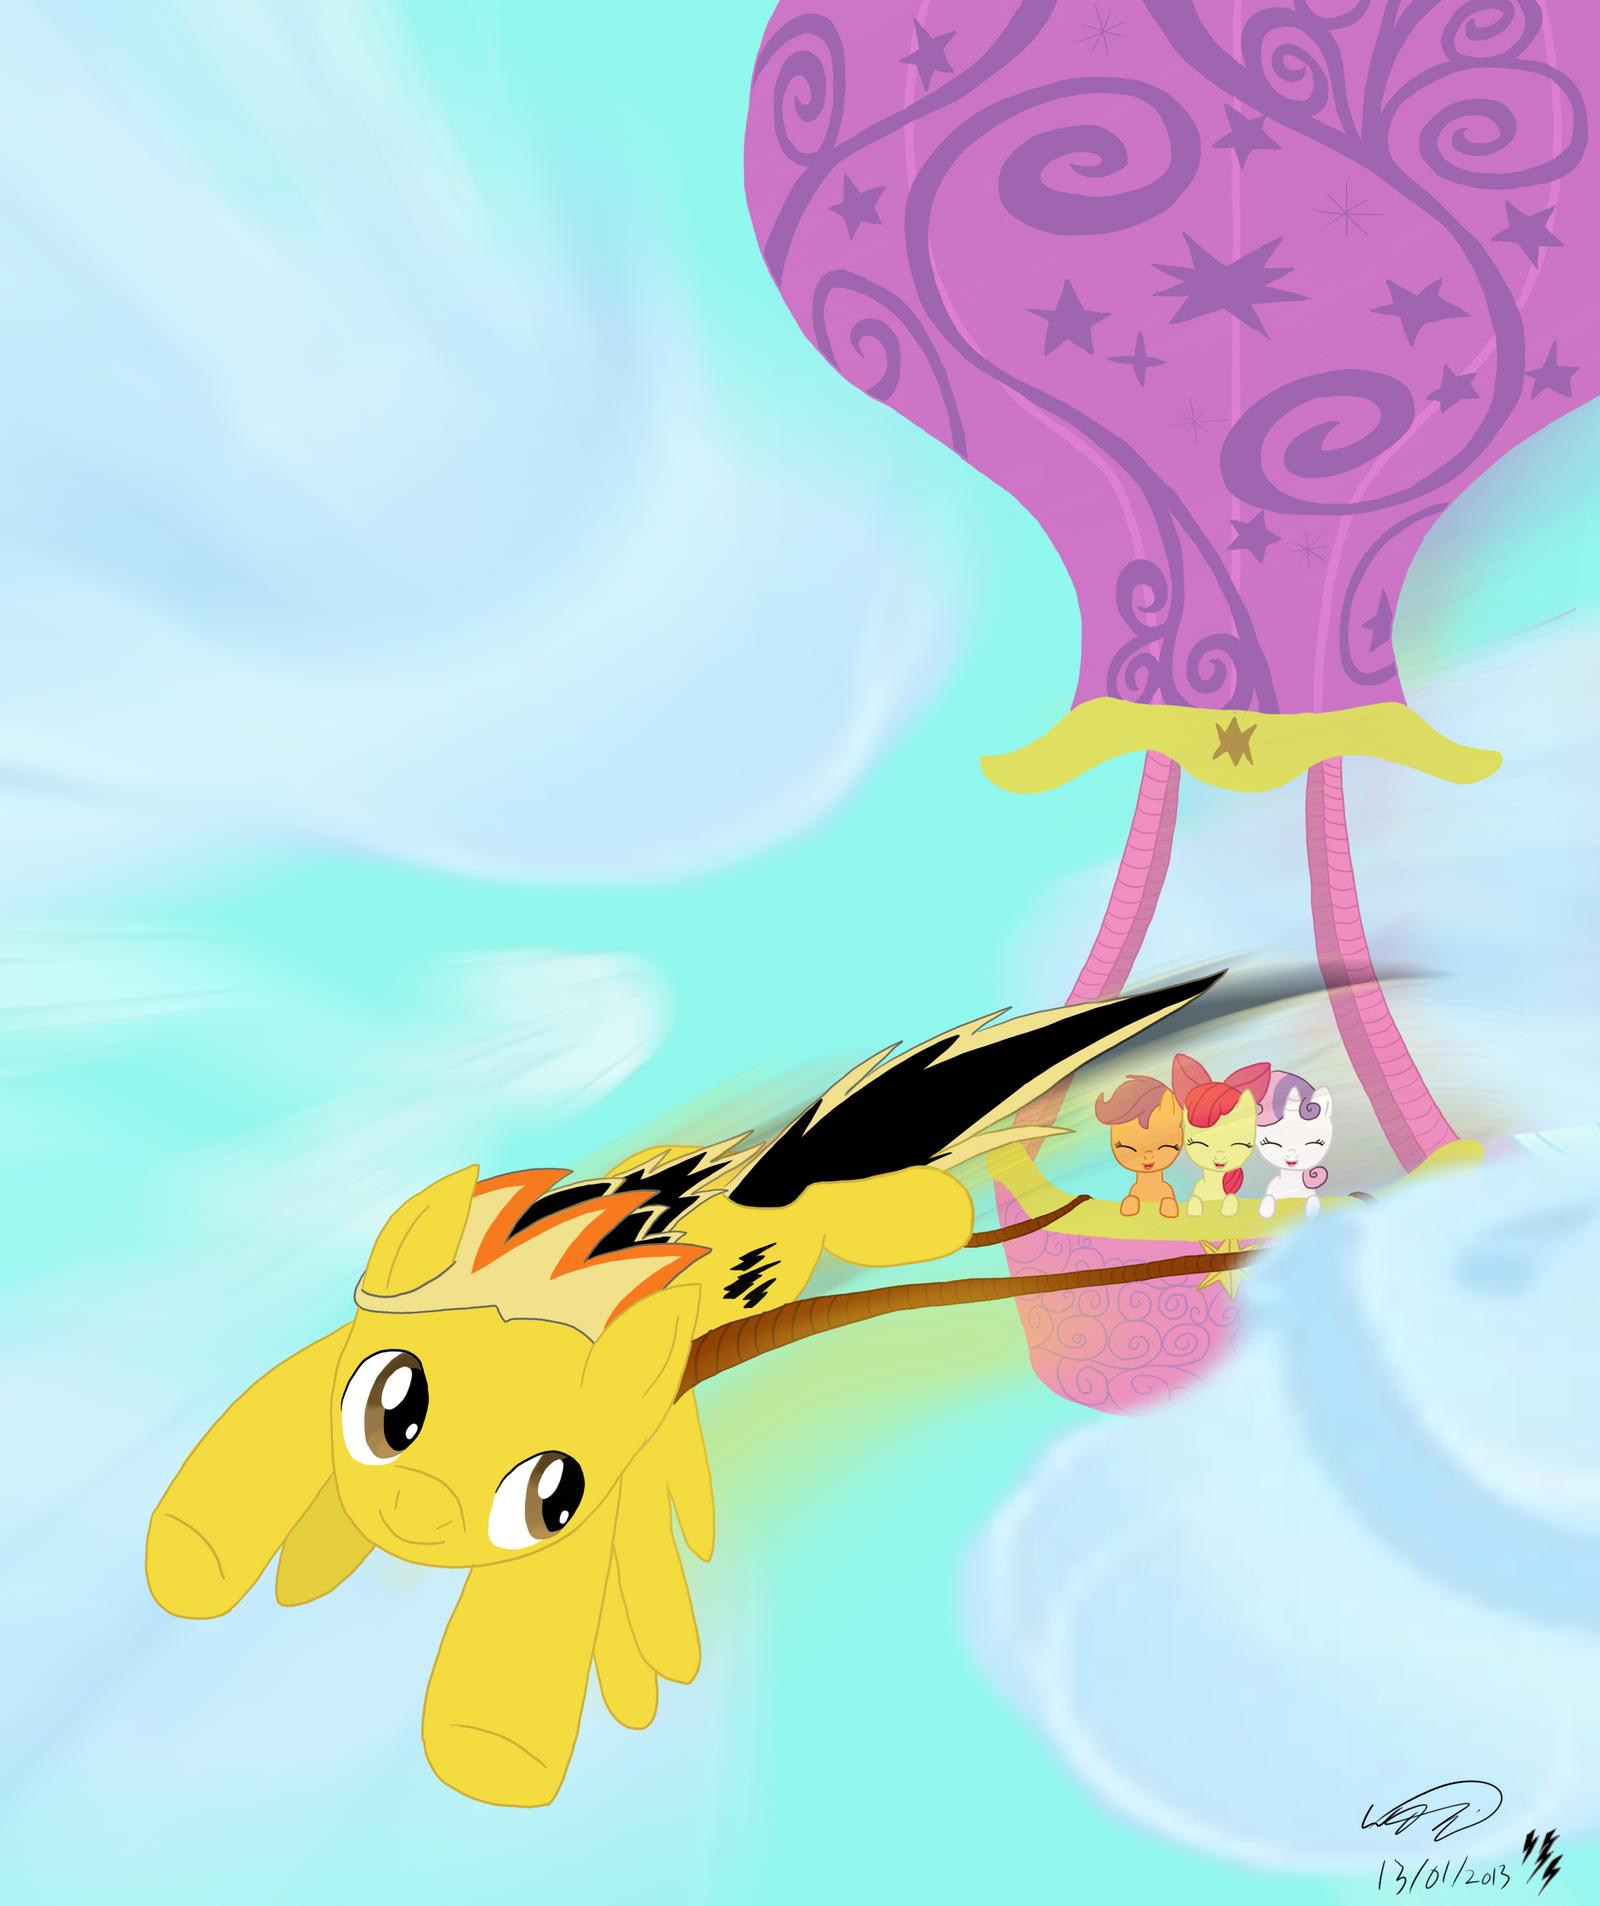 The CMC Balloon Ride by Electuroo